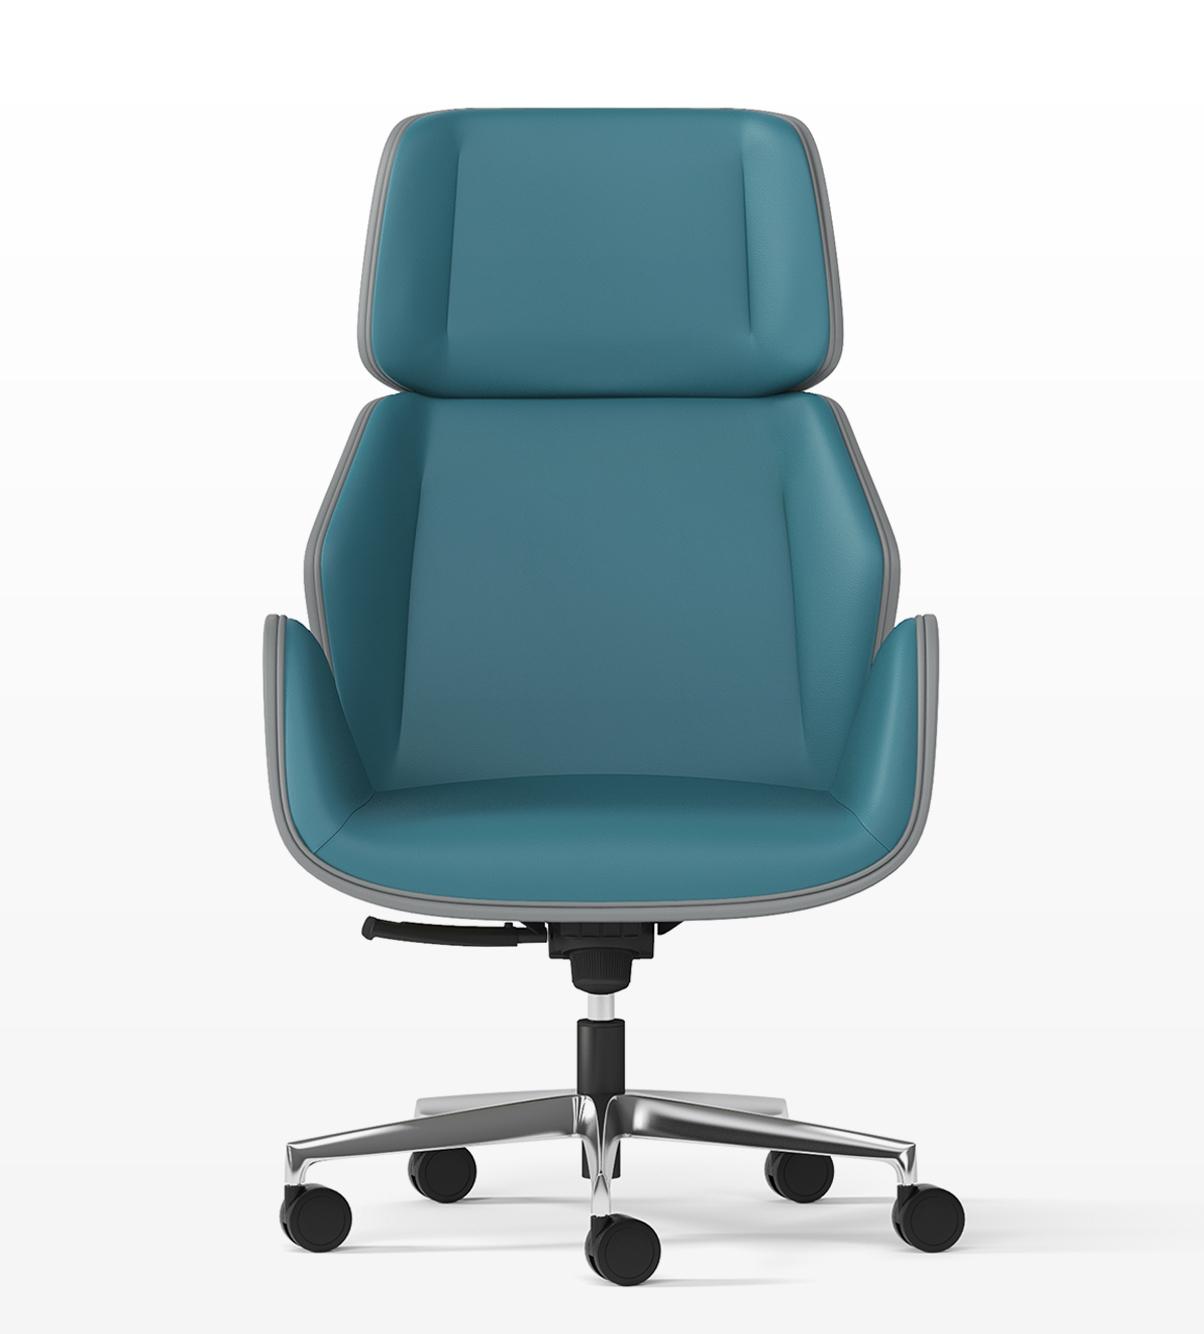 Arte&D (RU) Офисное кресло HAIKU от итальянского бренда Arte&D